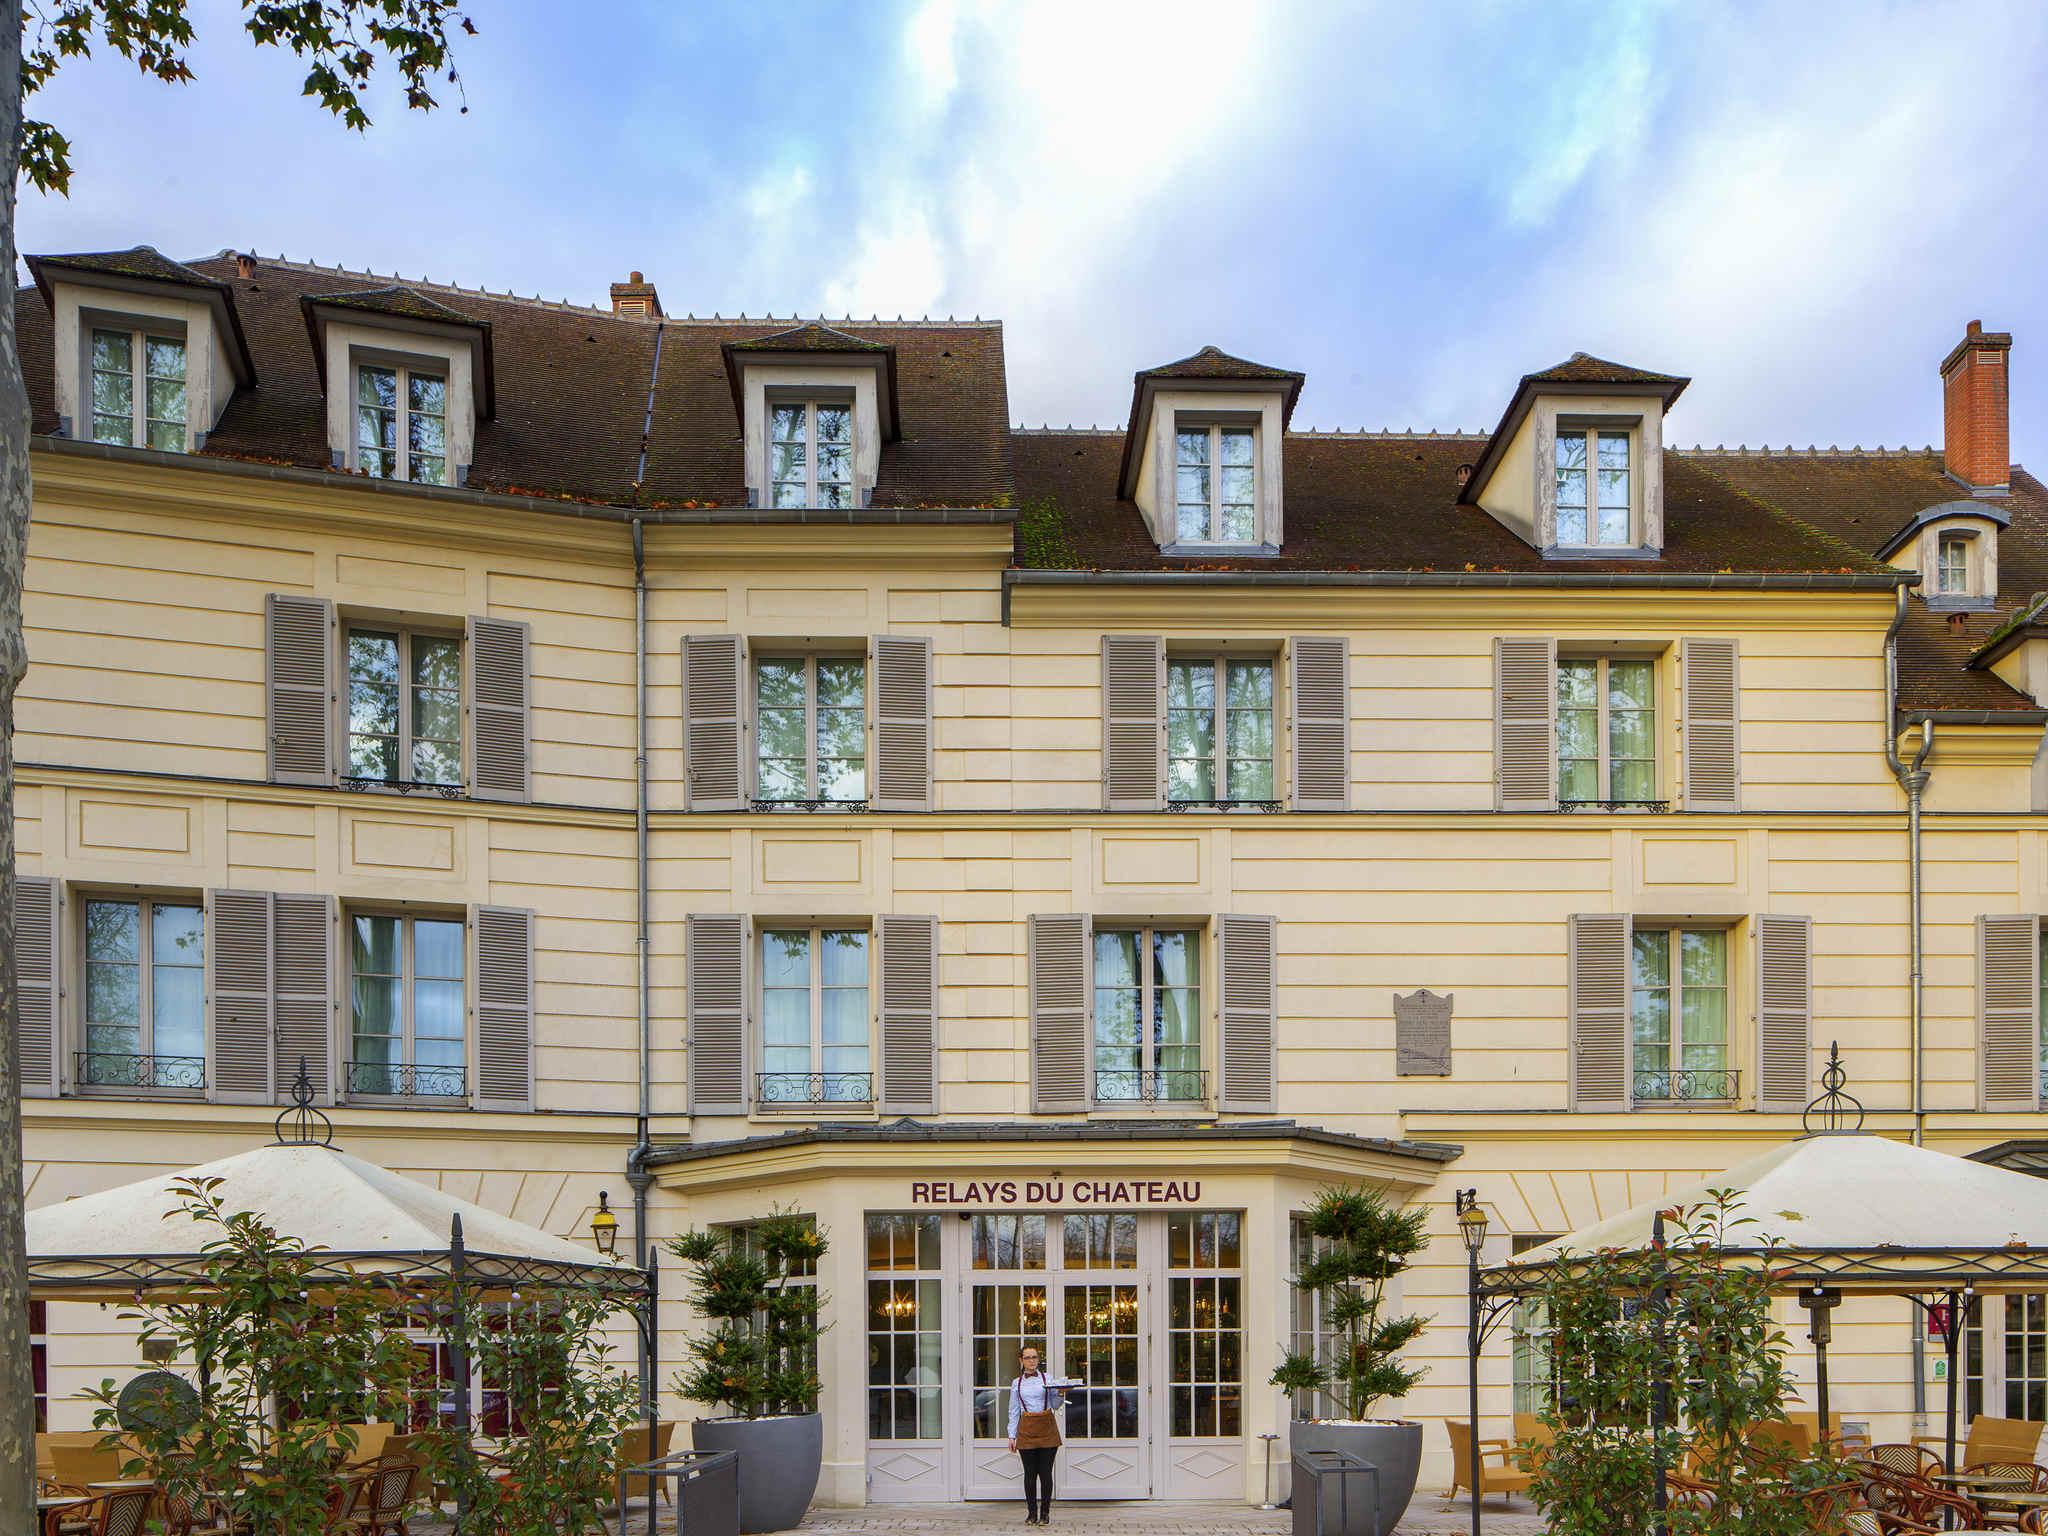 ホテル – Hôtel Mercure Rambouillet Relays du Château